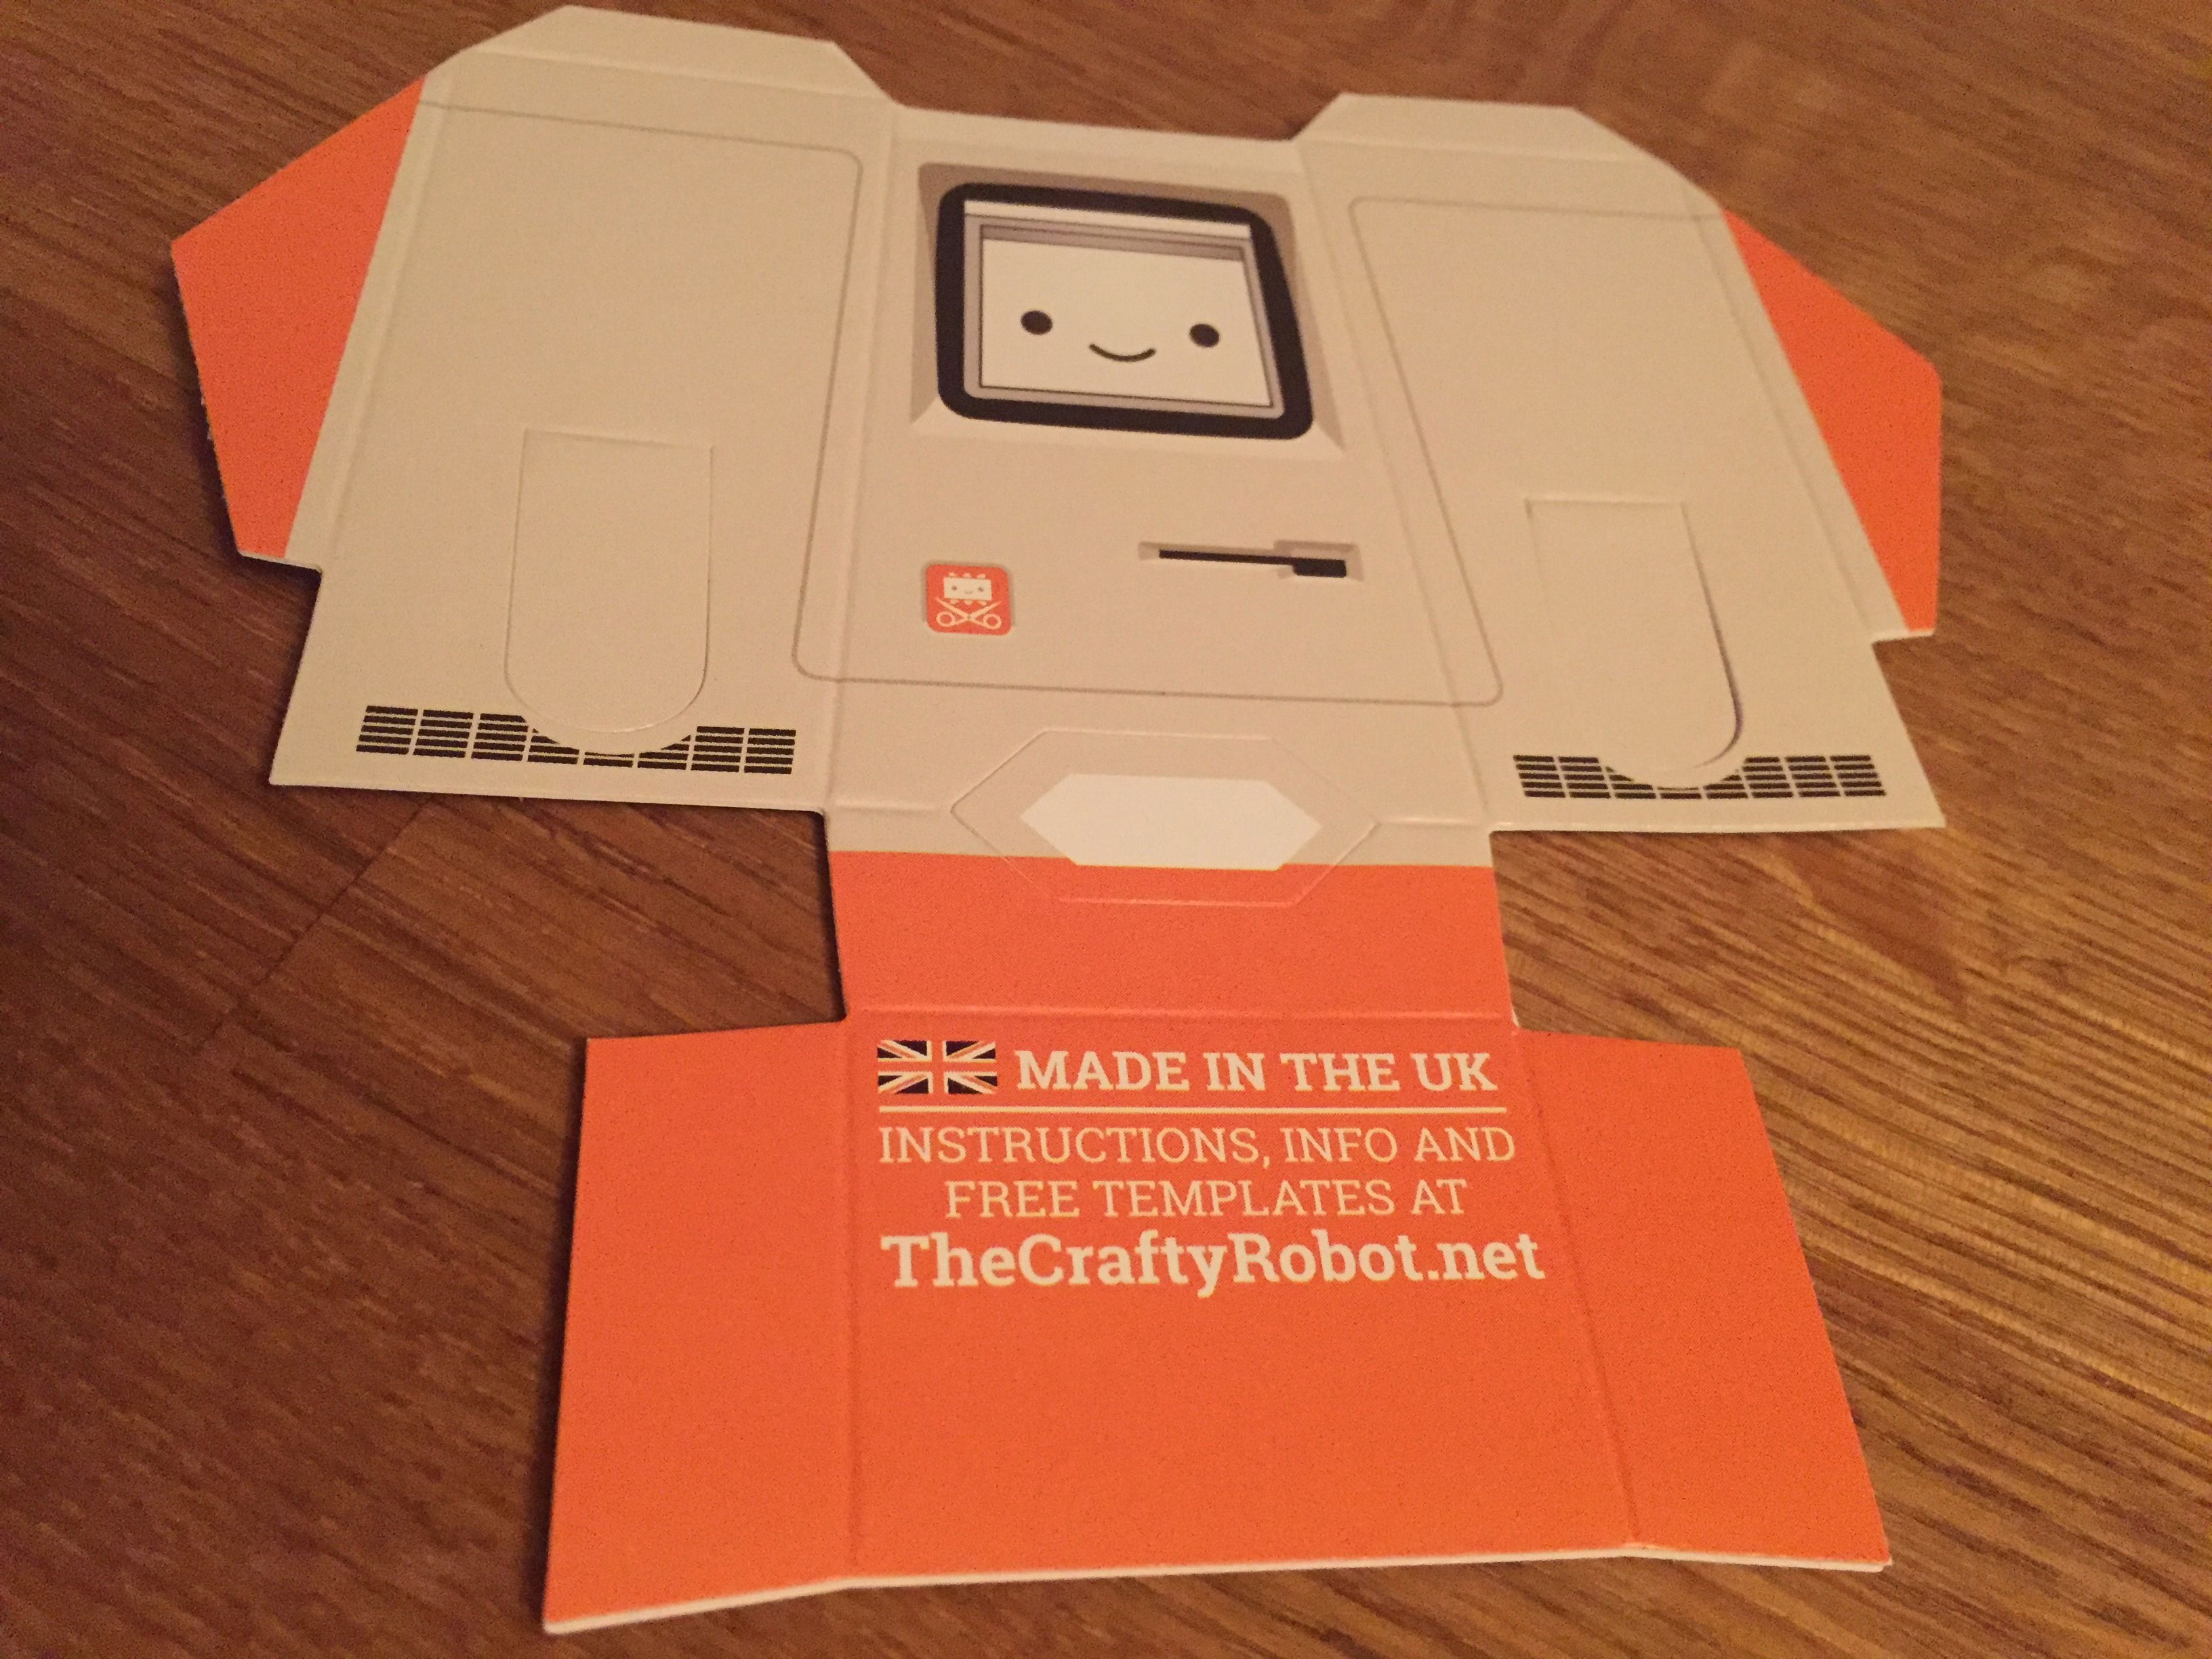 Crafty Robots